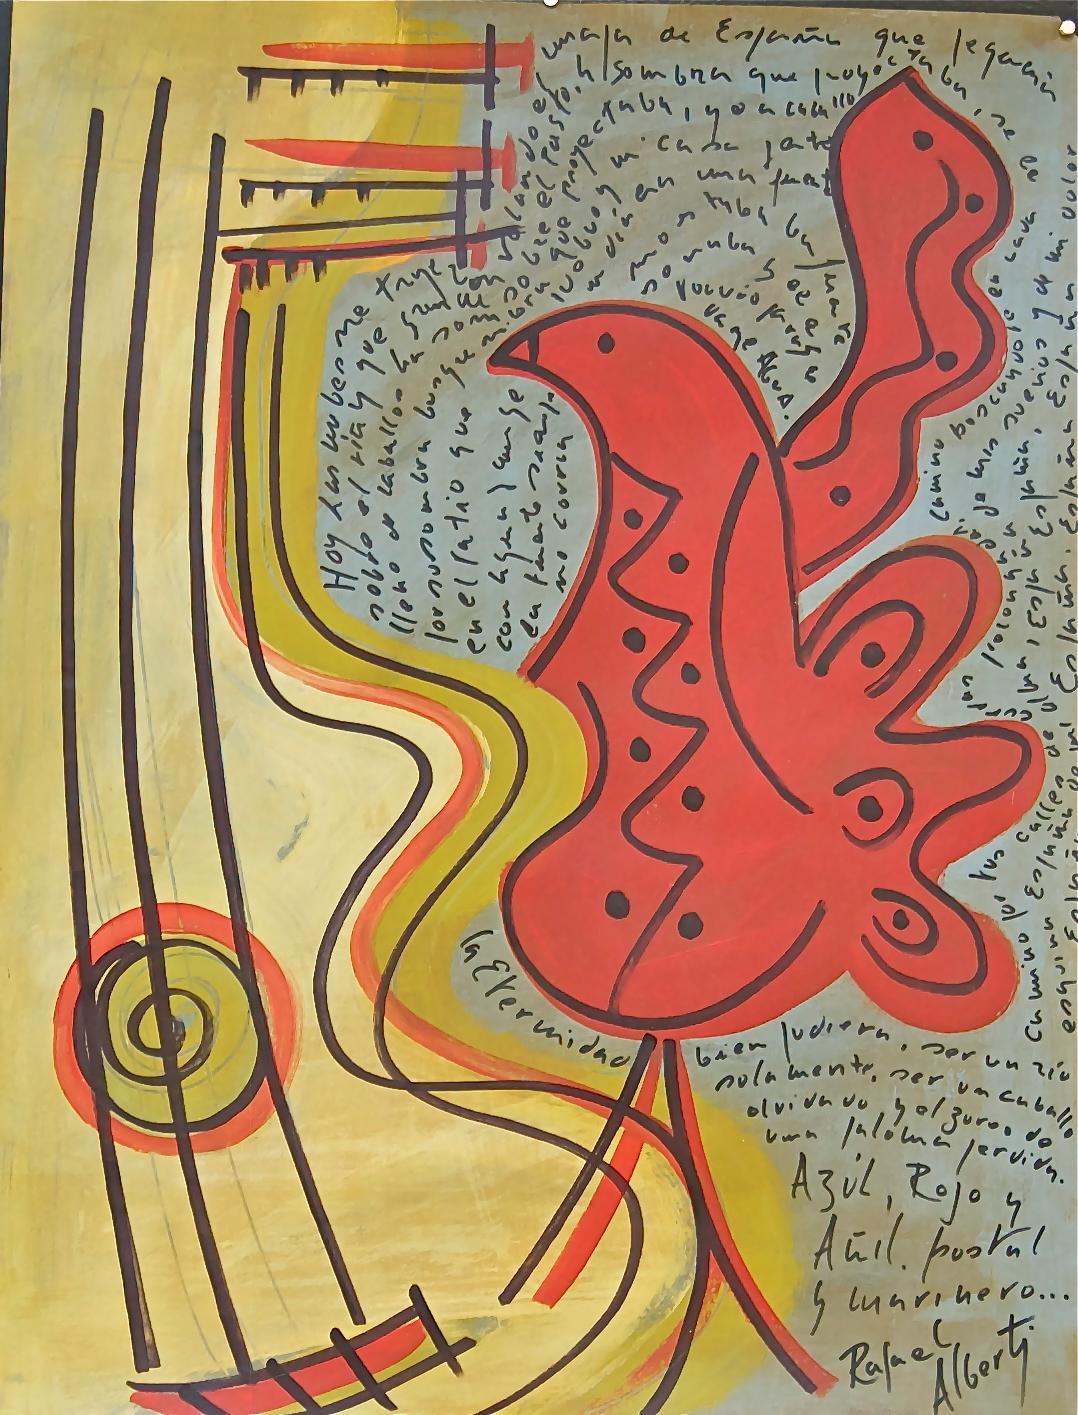 Guitarra y paloma - Pintura de Rafael Alberti